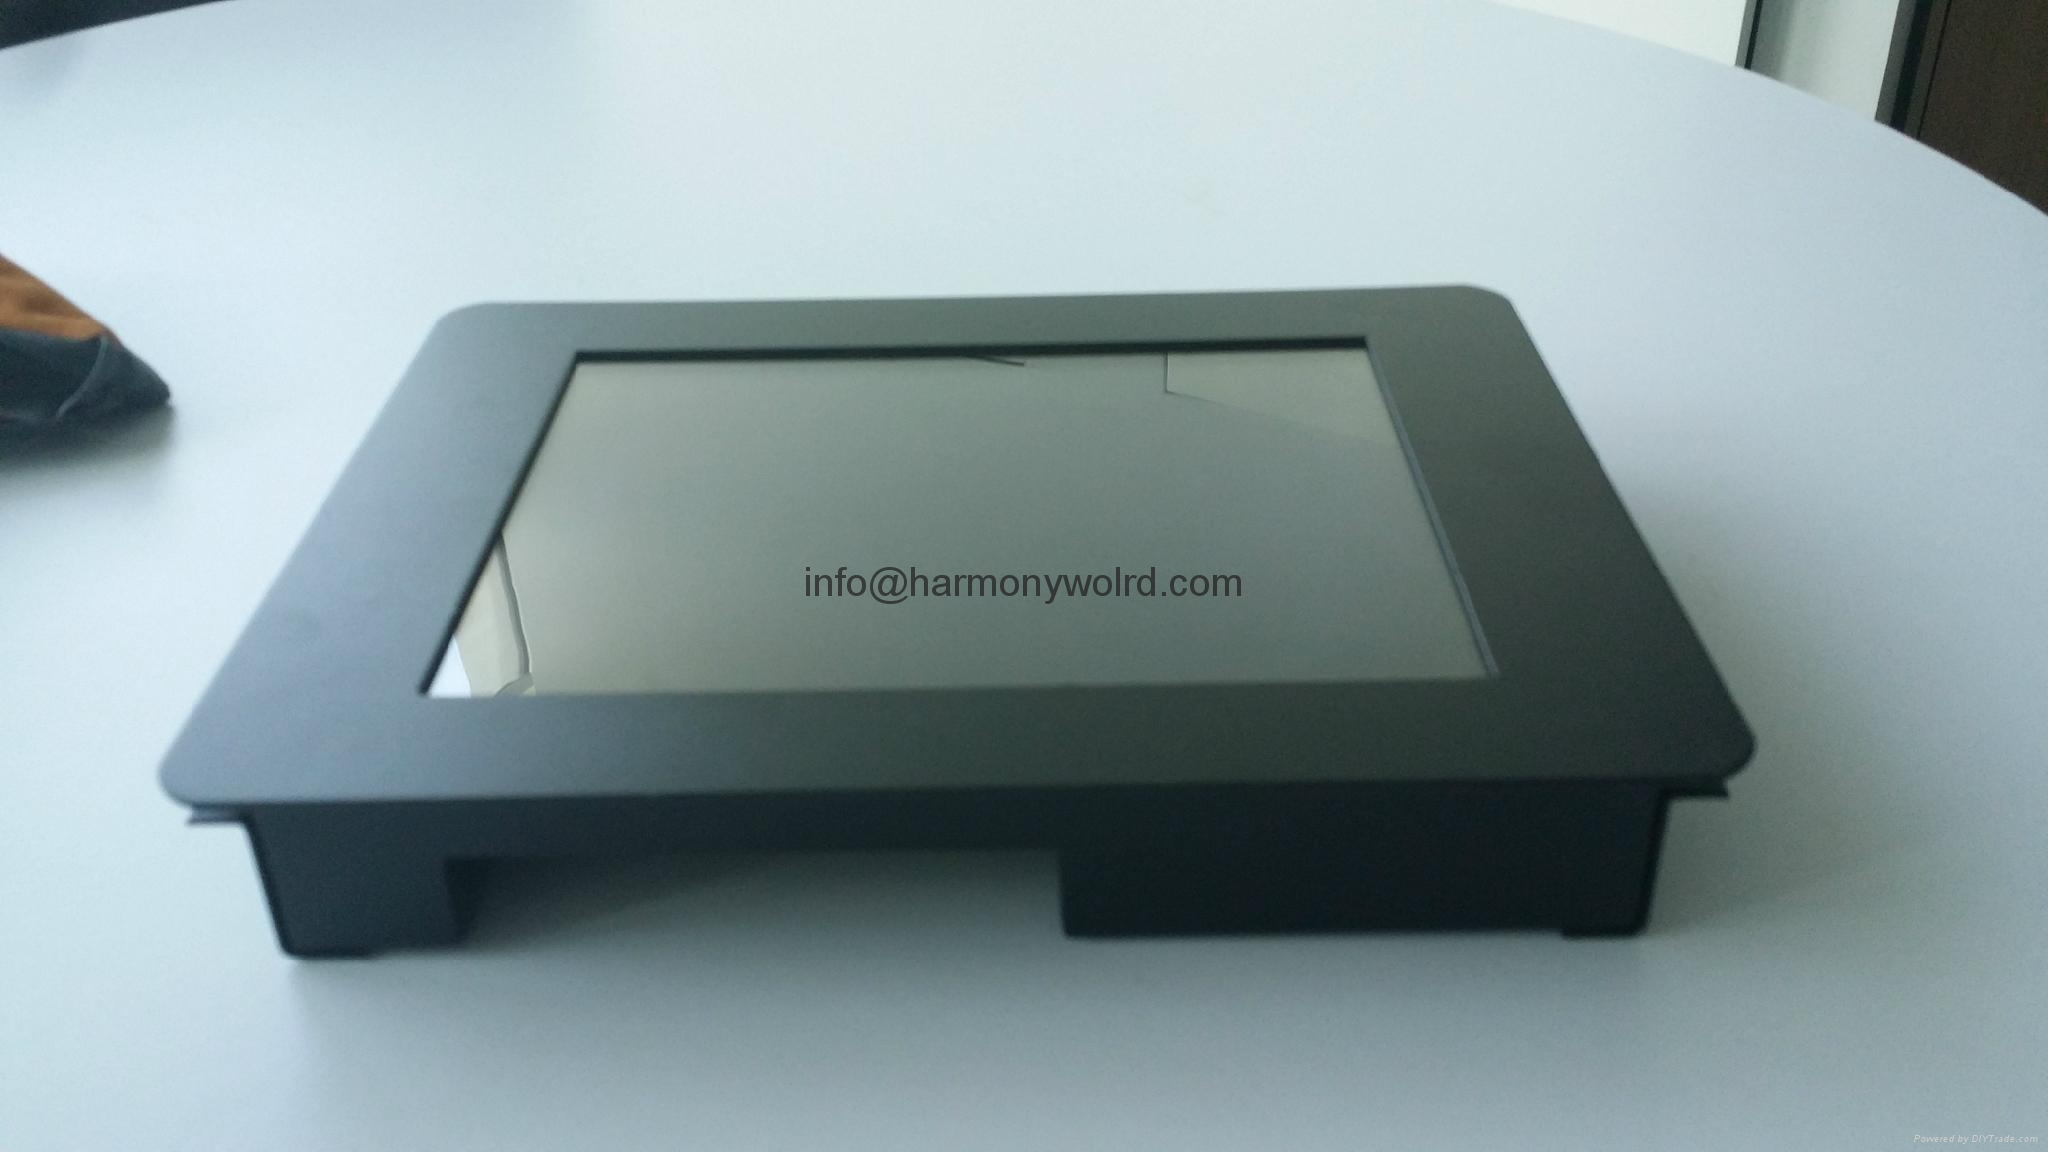 Upgrade Monitor Siemens Sinumerik SM-1200 805 (SM-1200) 12 inch CRT To LCDs   5